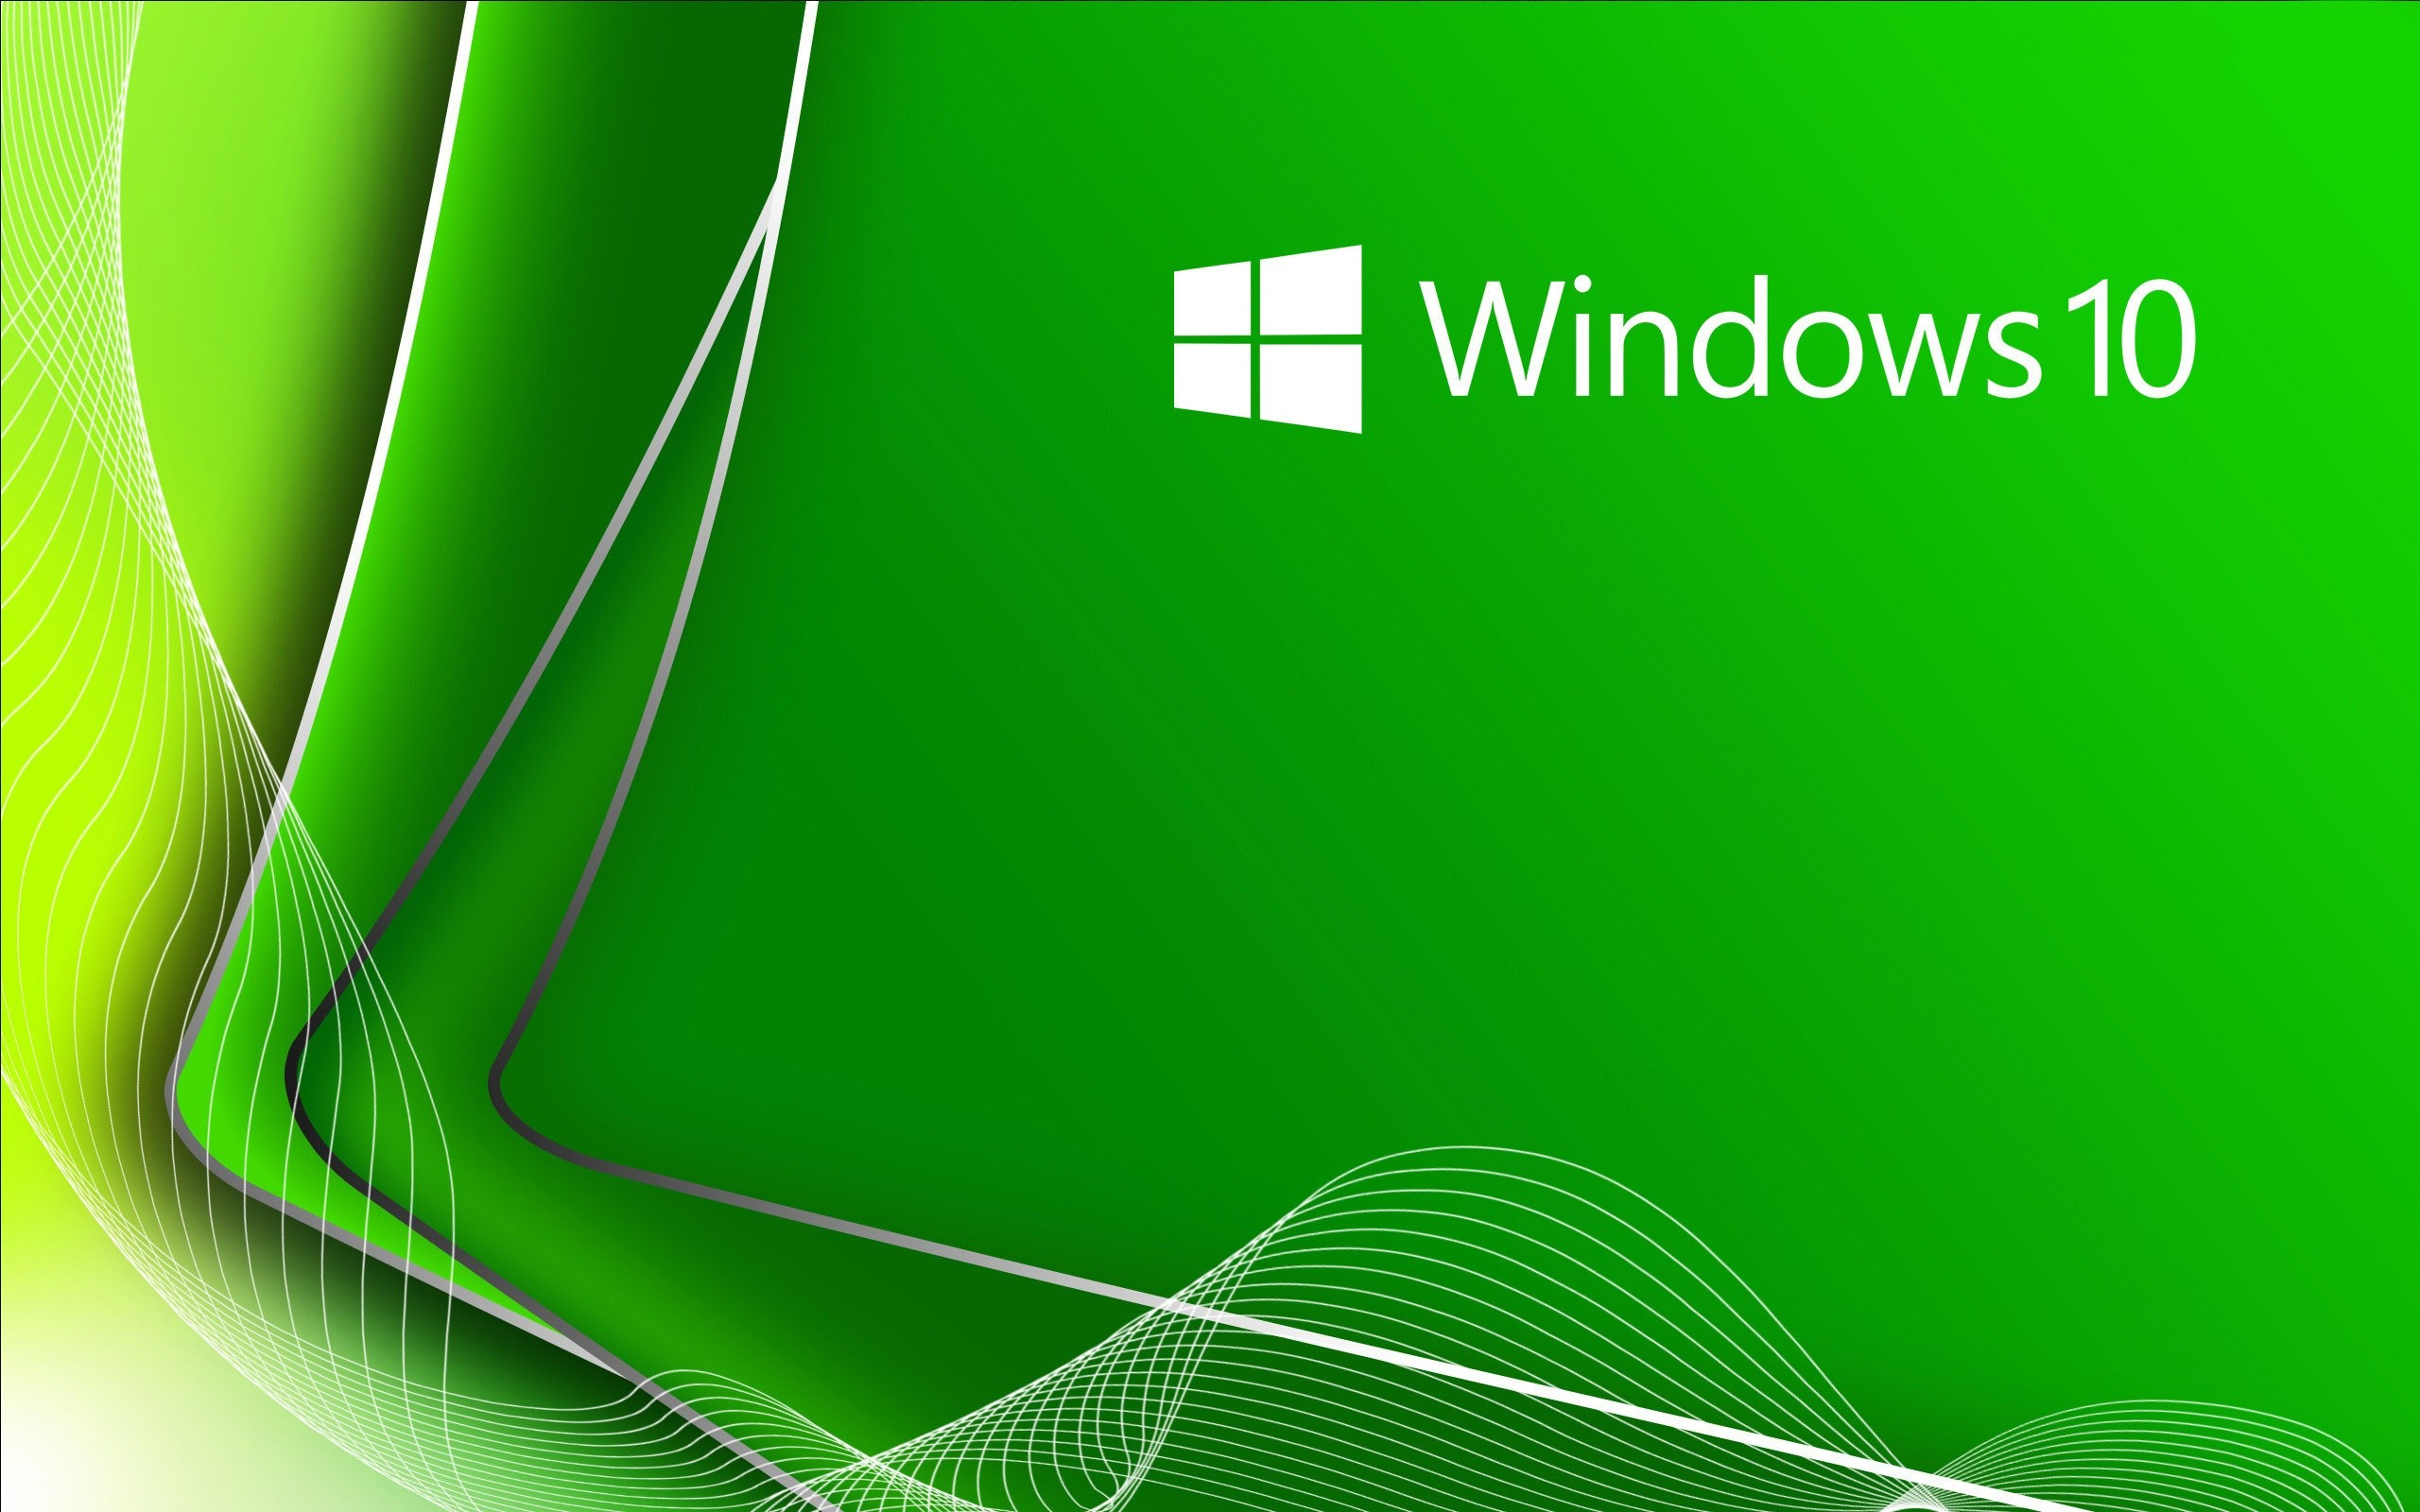 Clock Live Wallpaper Windows 10 57 Images